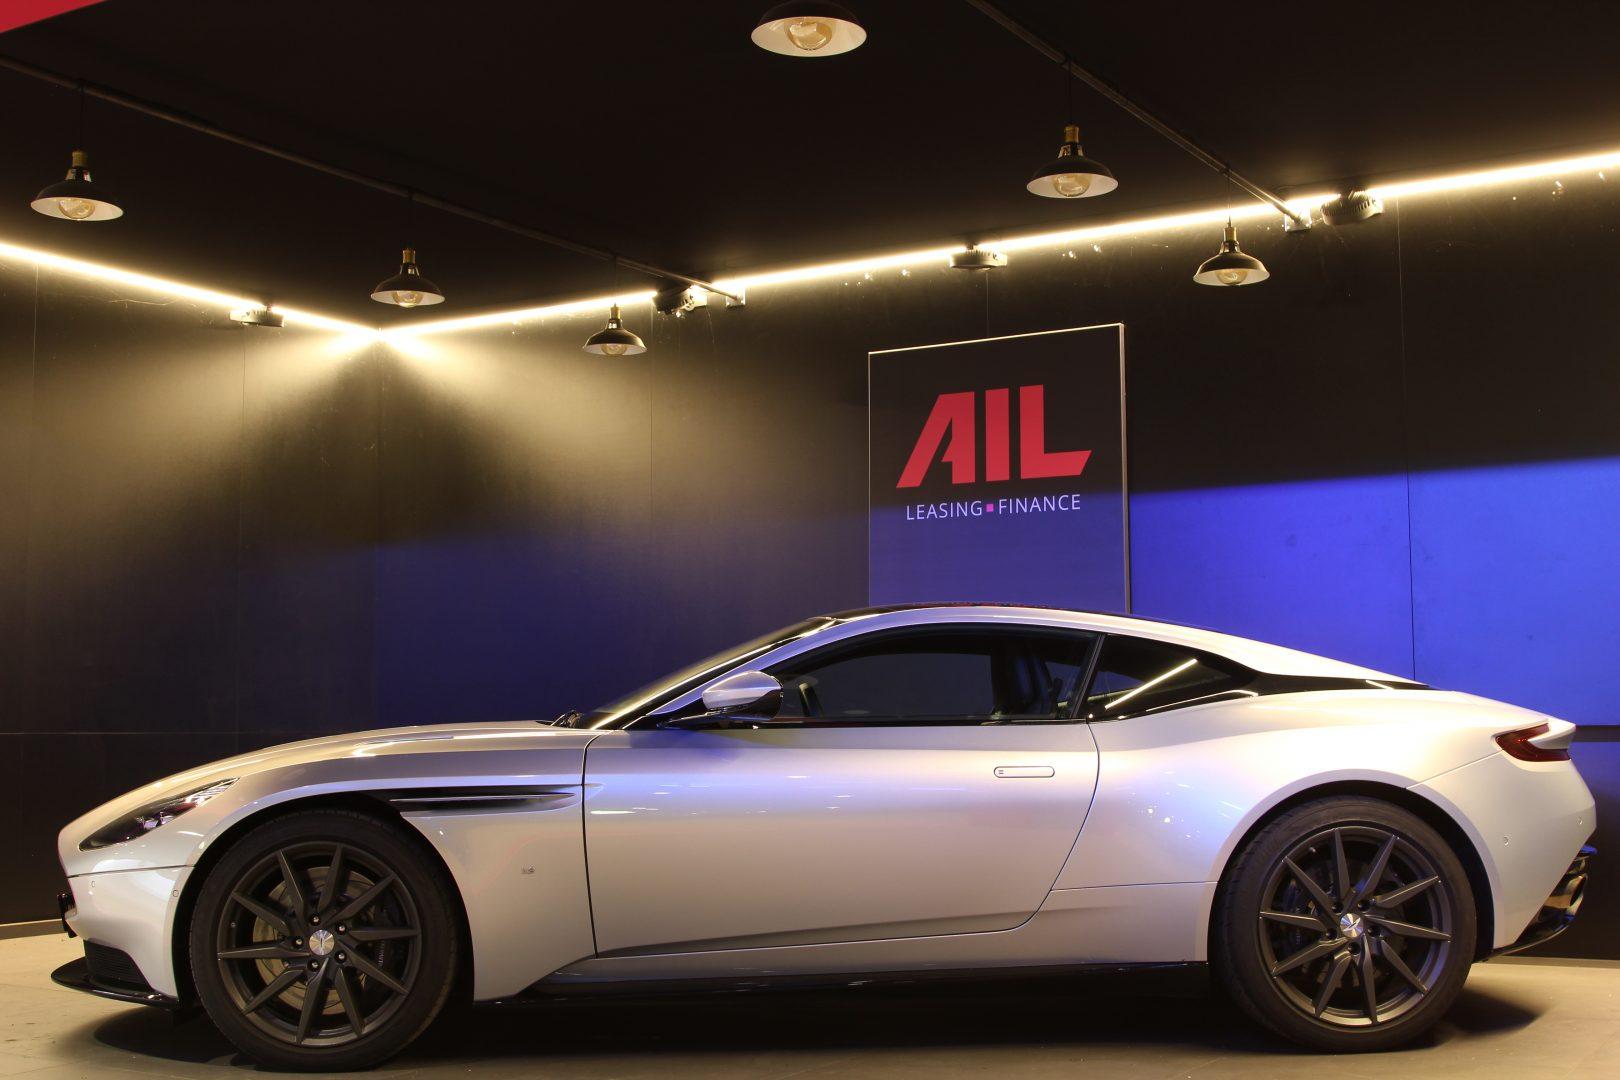 AIL Aston Martin DB11 Coupe 5.2 V12 1